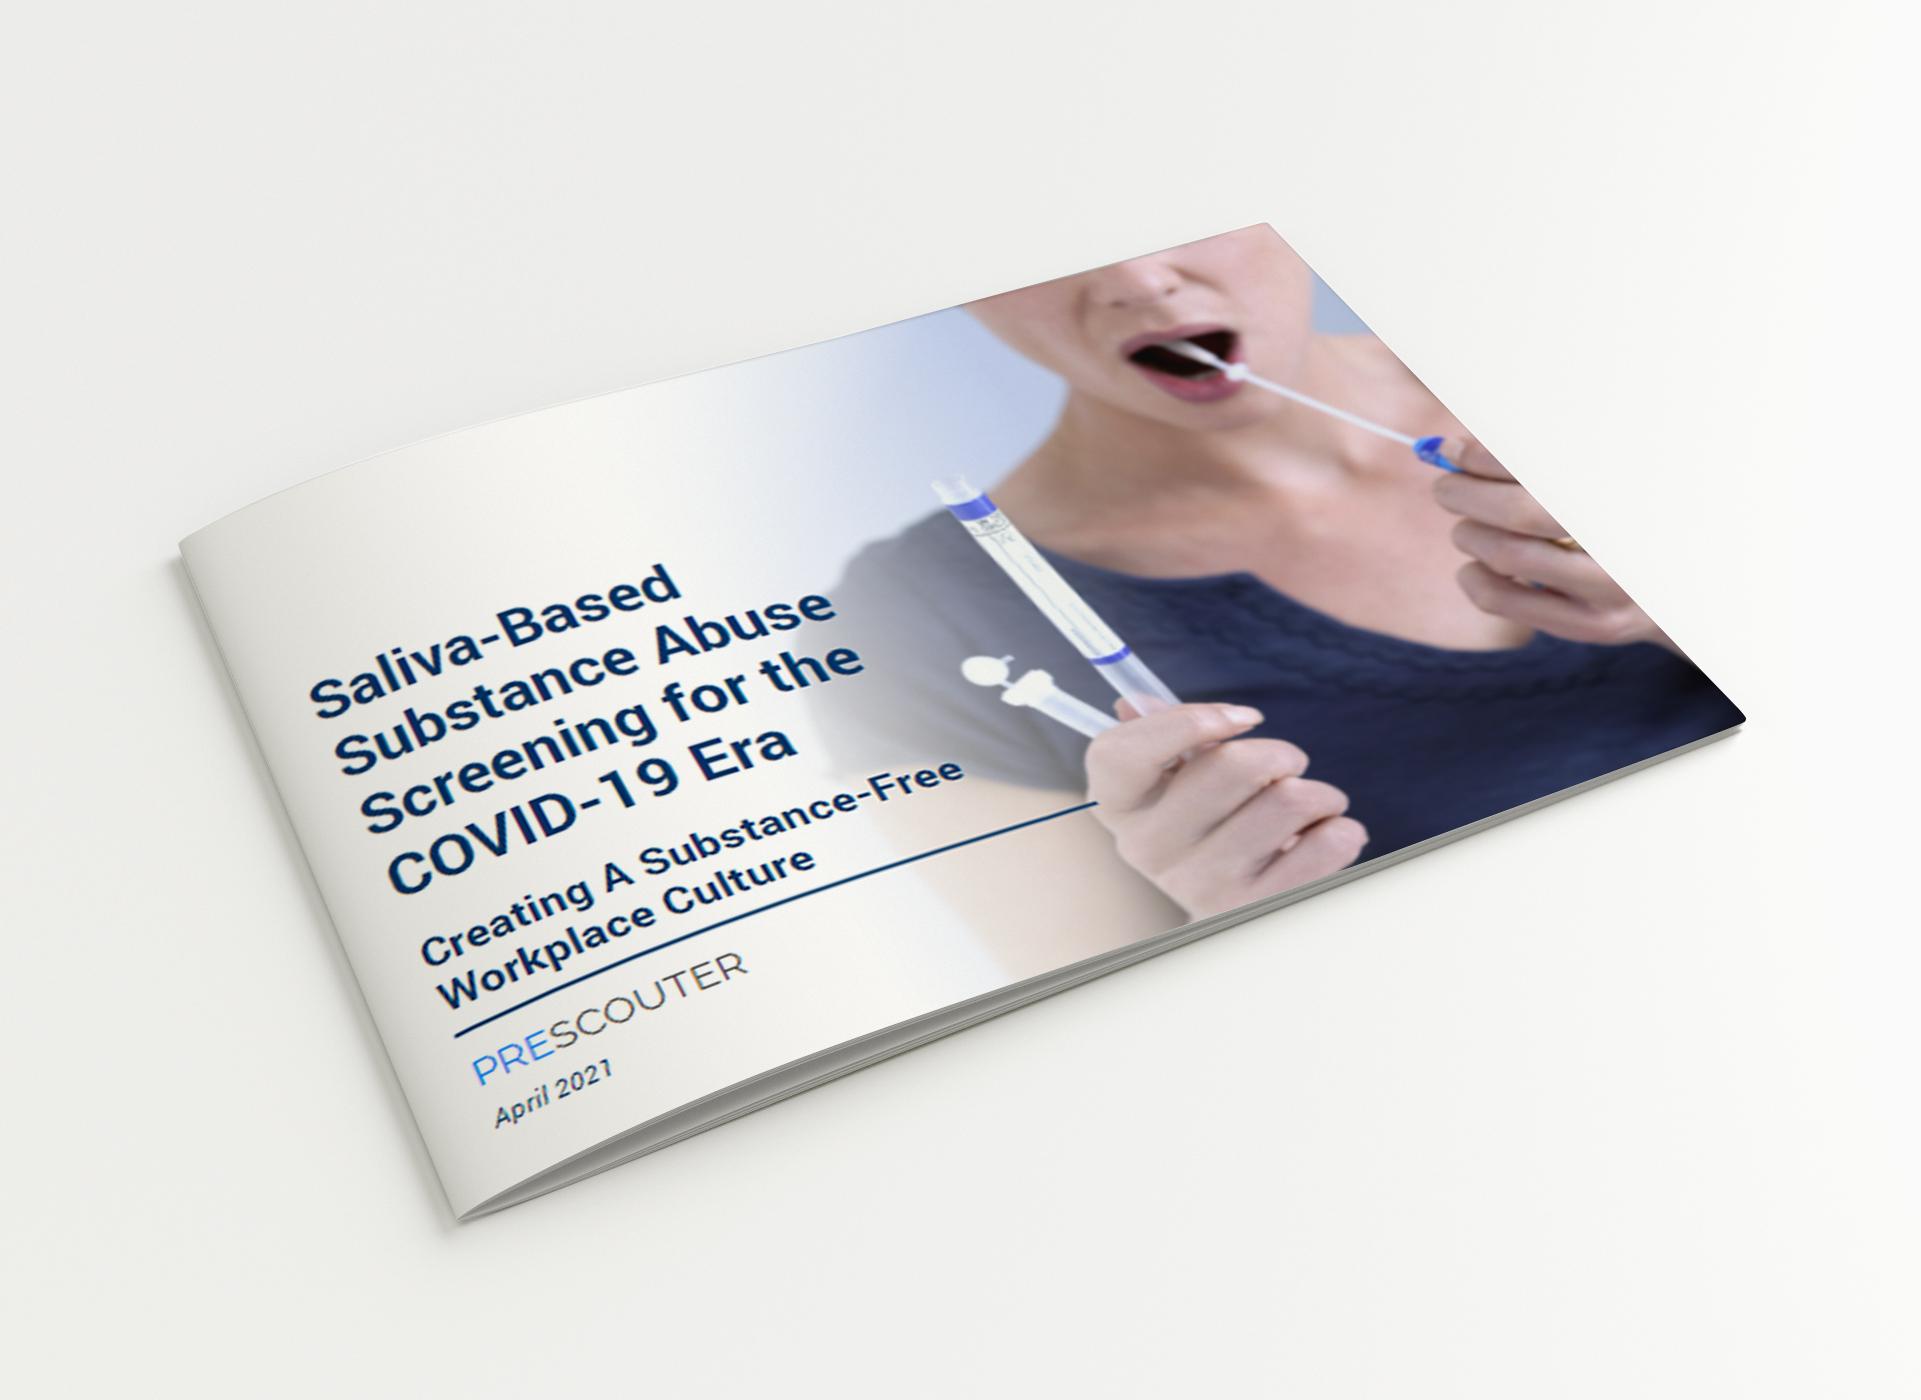 Saliva-Based Substance Abuse Screening for the COVID-19 Era